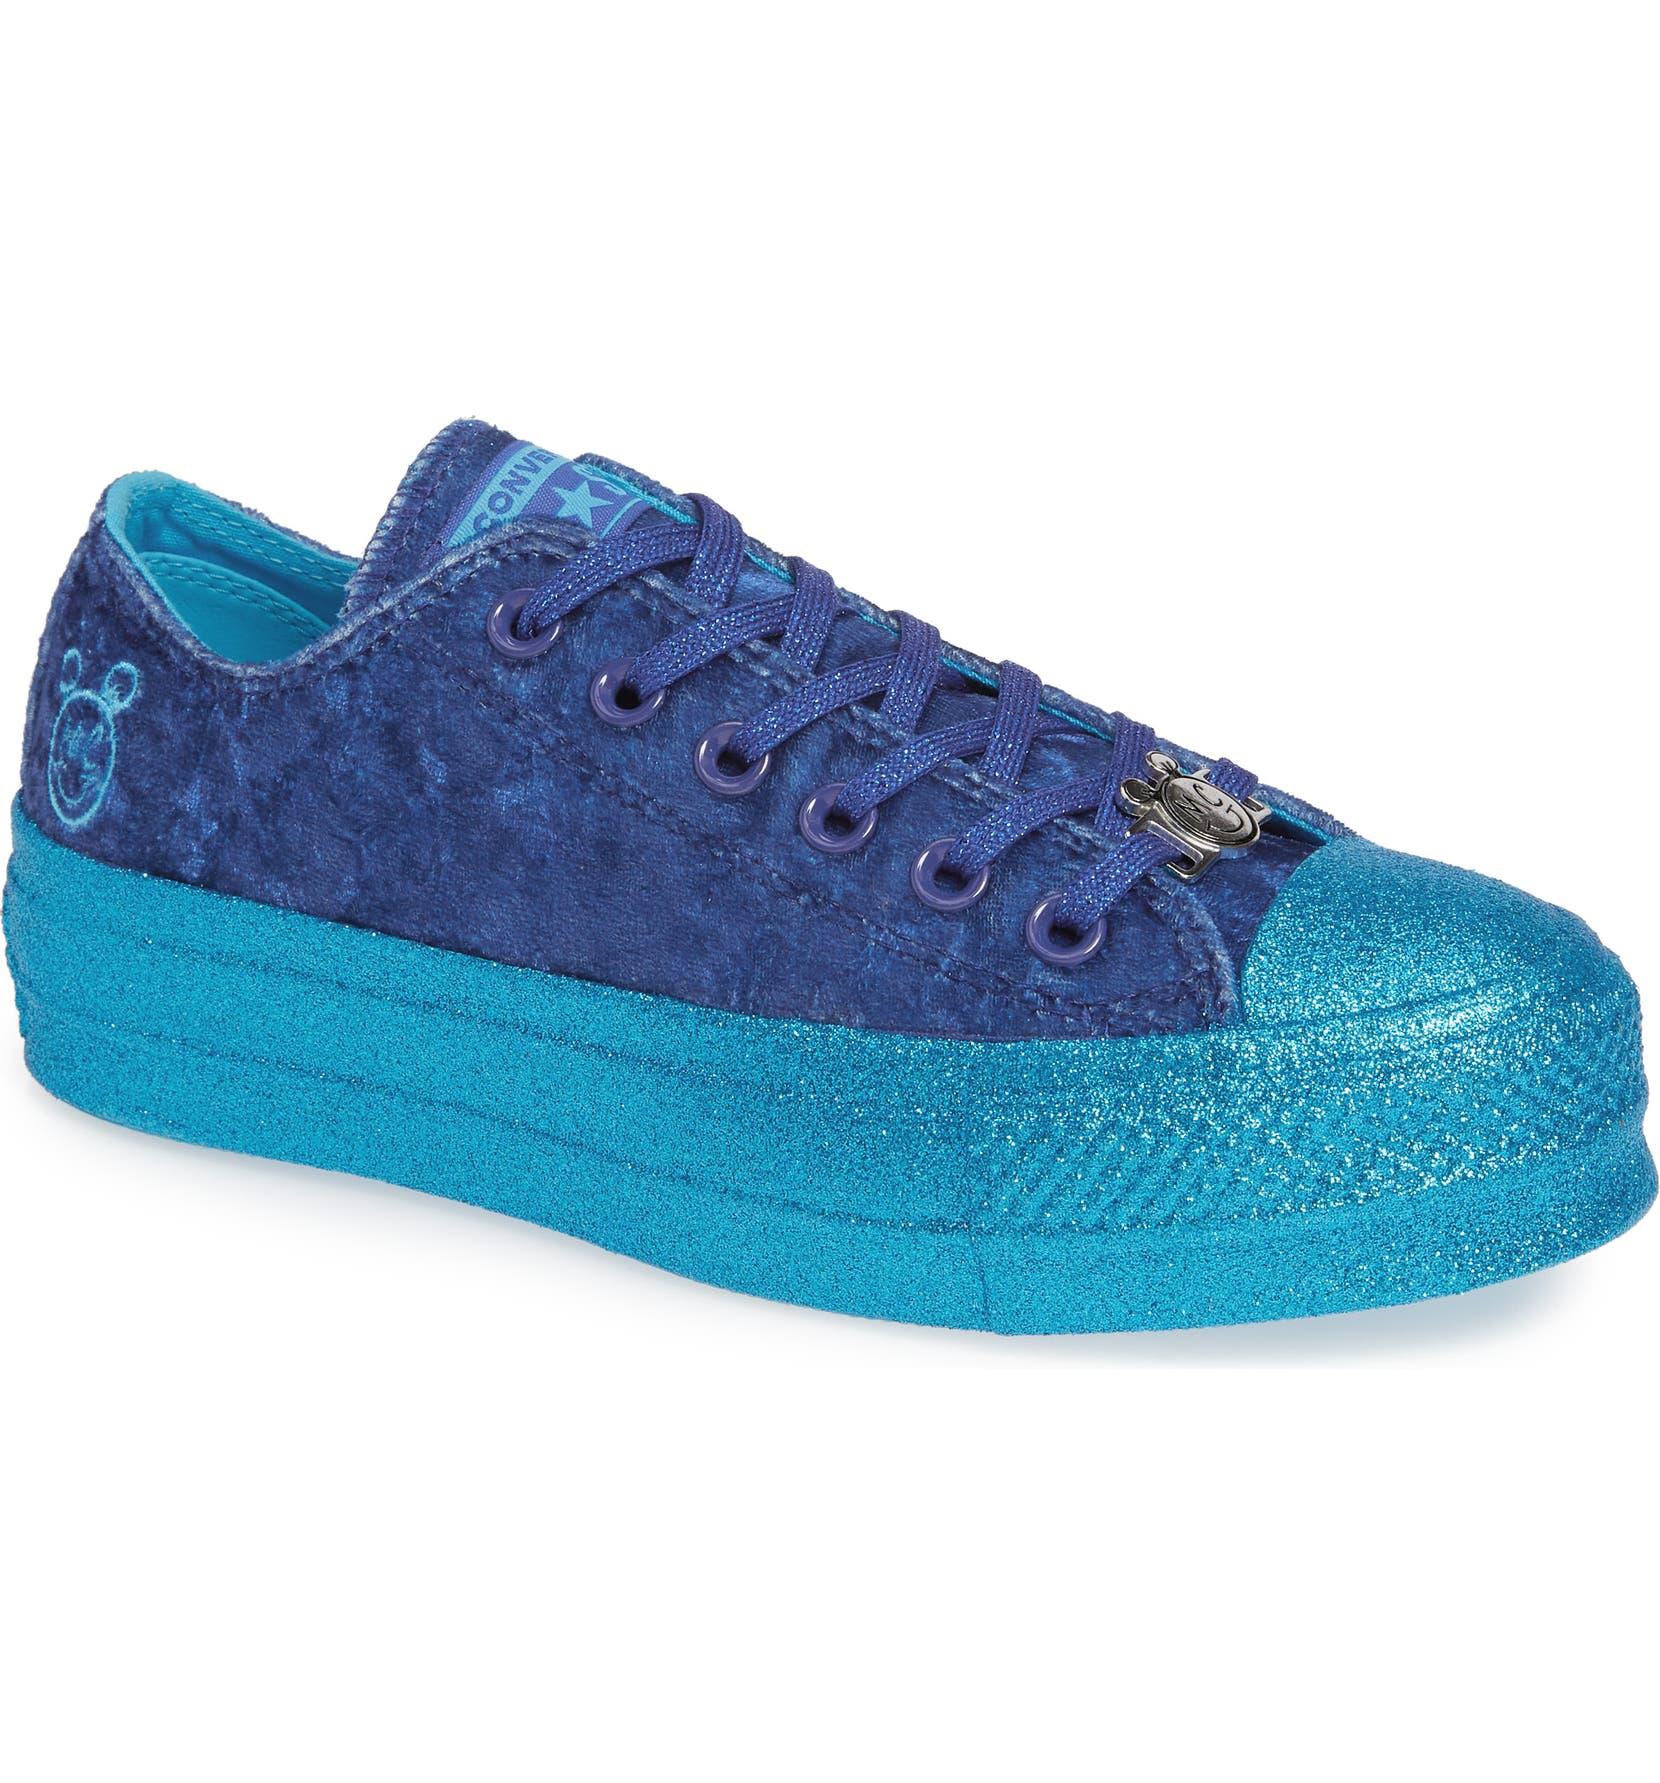 c4a52a3f1f0 Converse x Miley Cyrus Chuck Taylor All-Star Lo Sneaker (Women ...